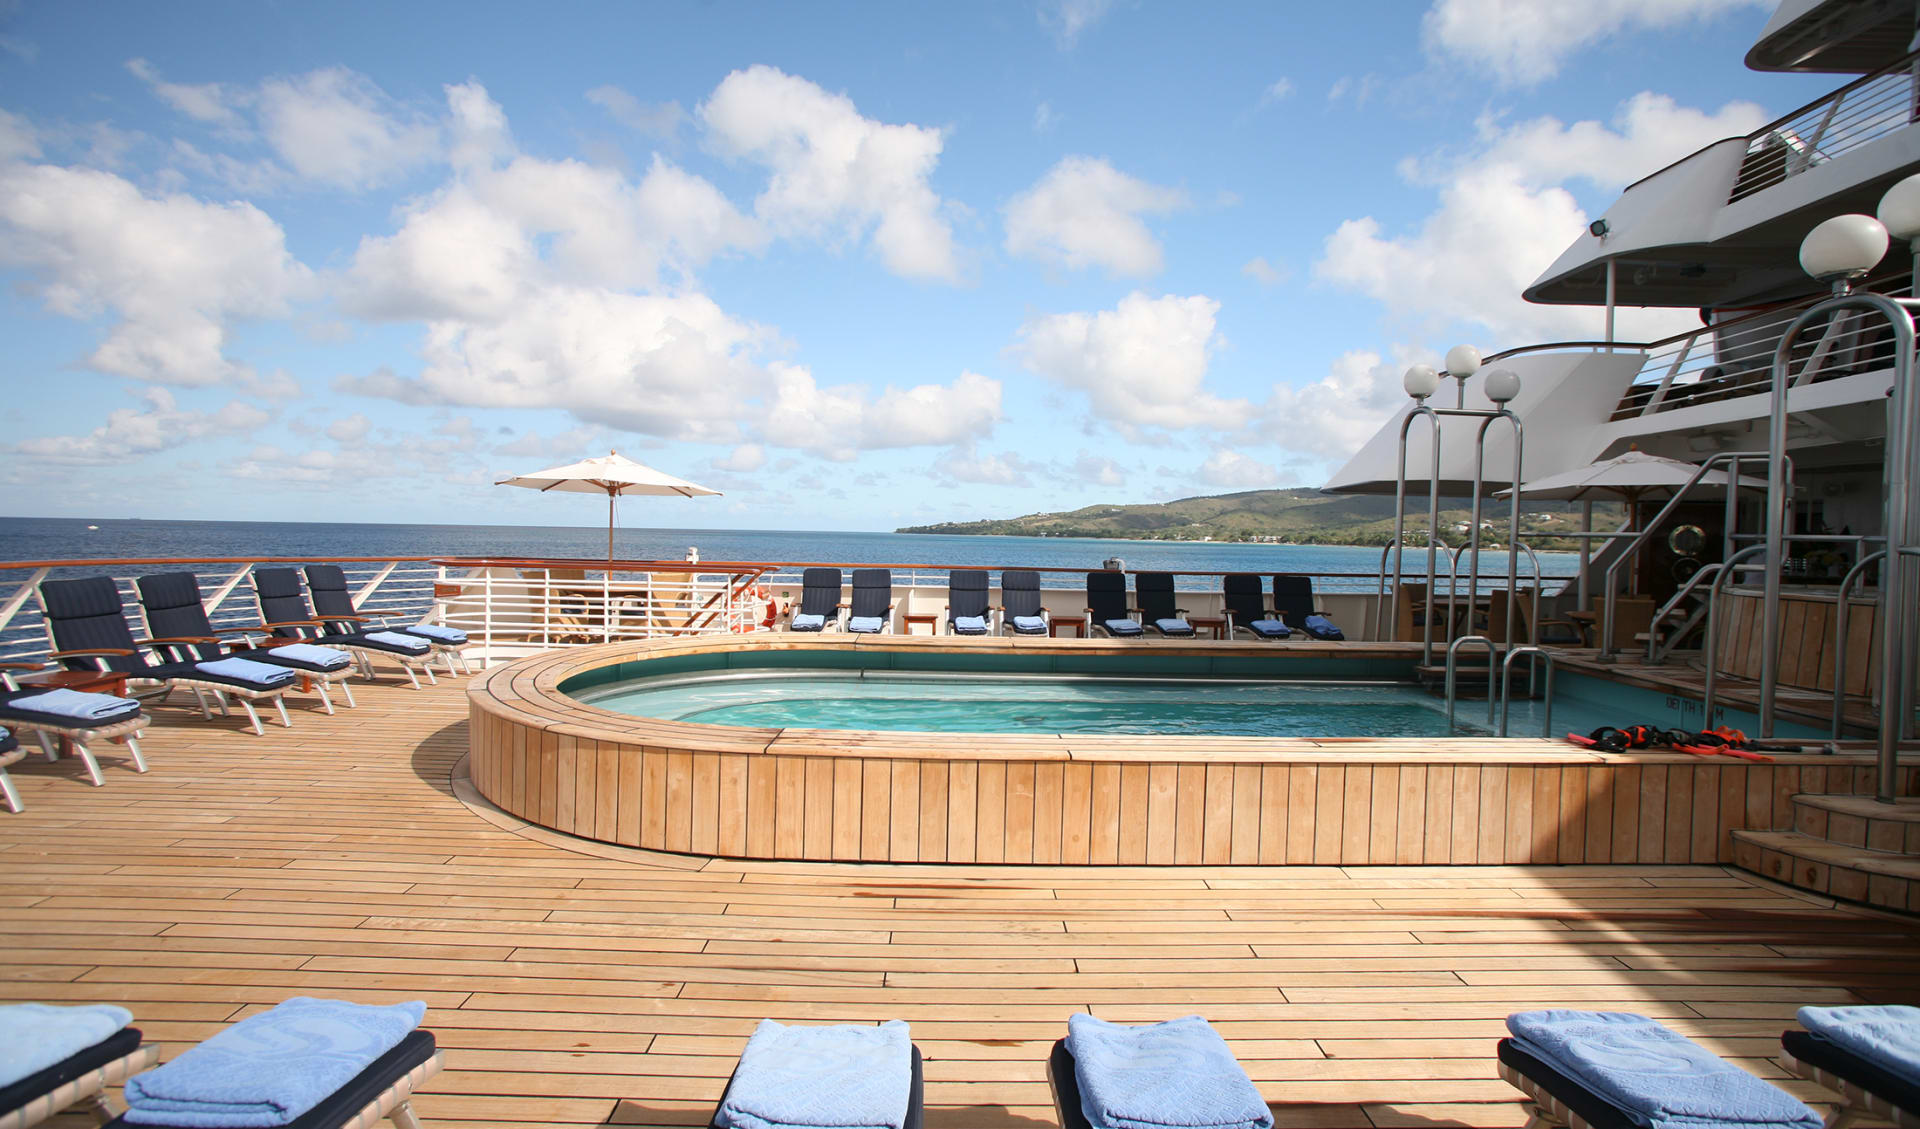 Seabourn Kreuzfahrt Pool